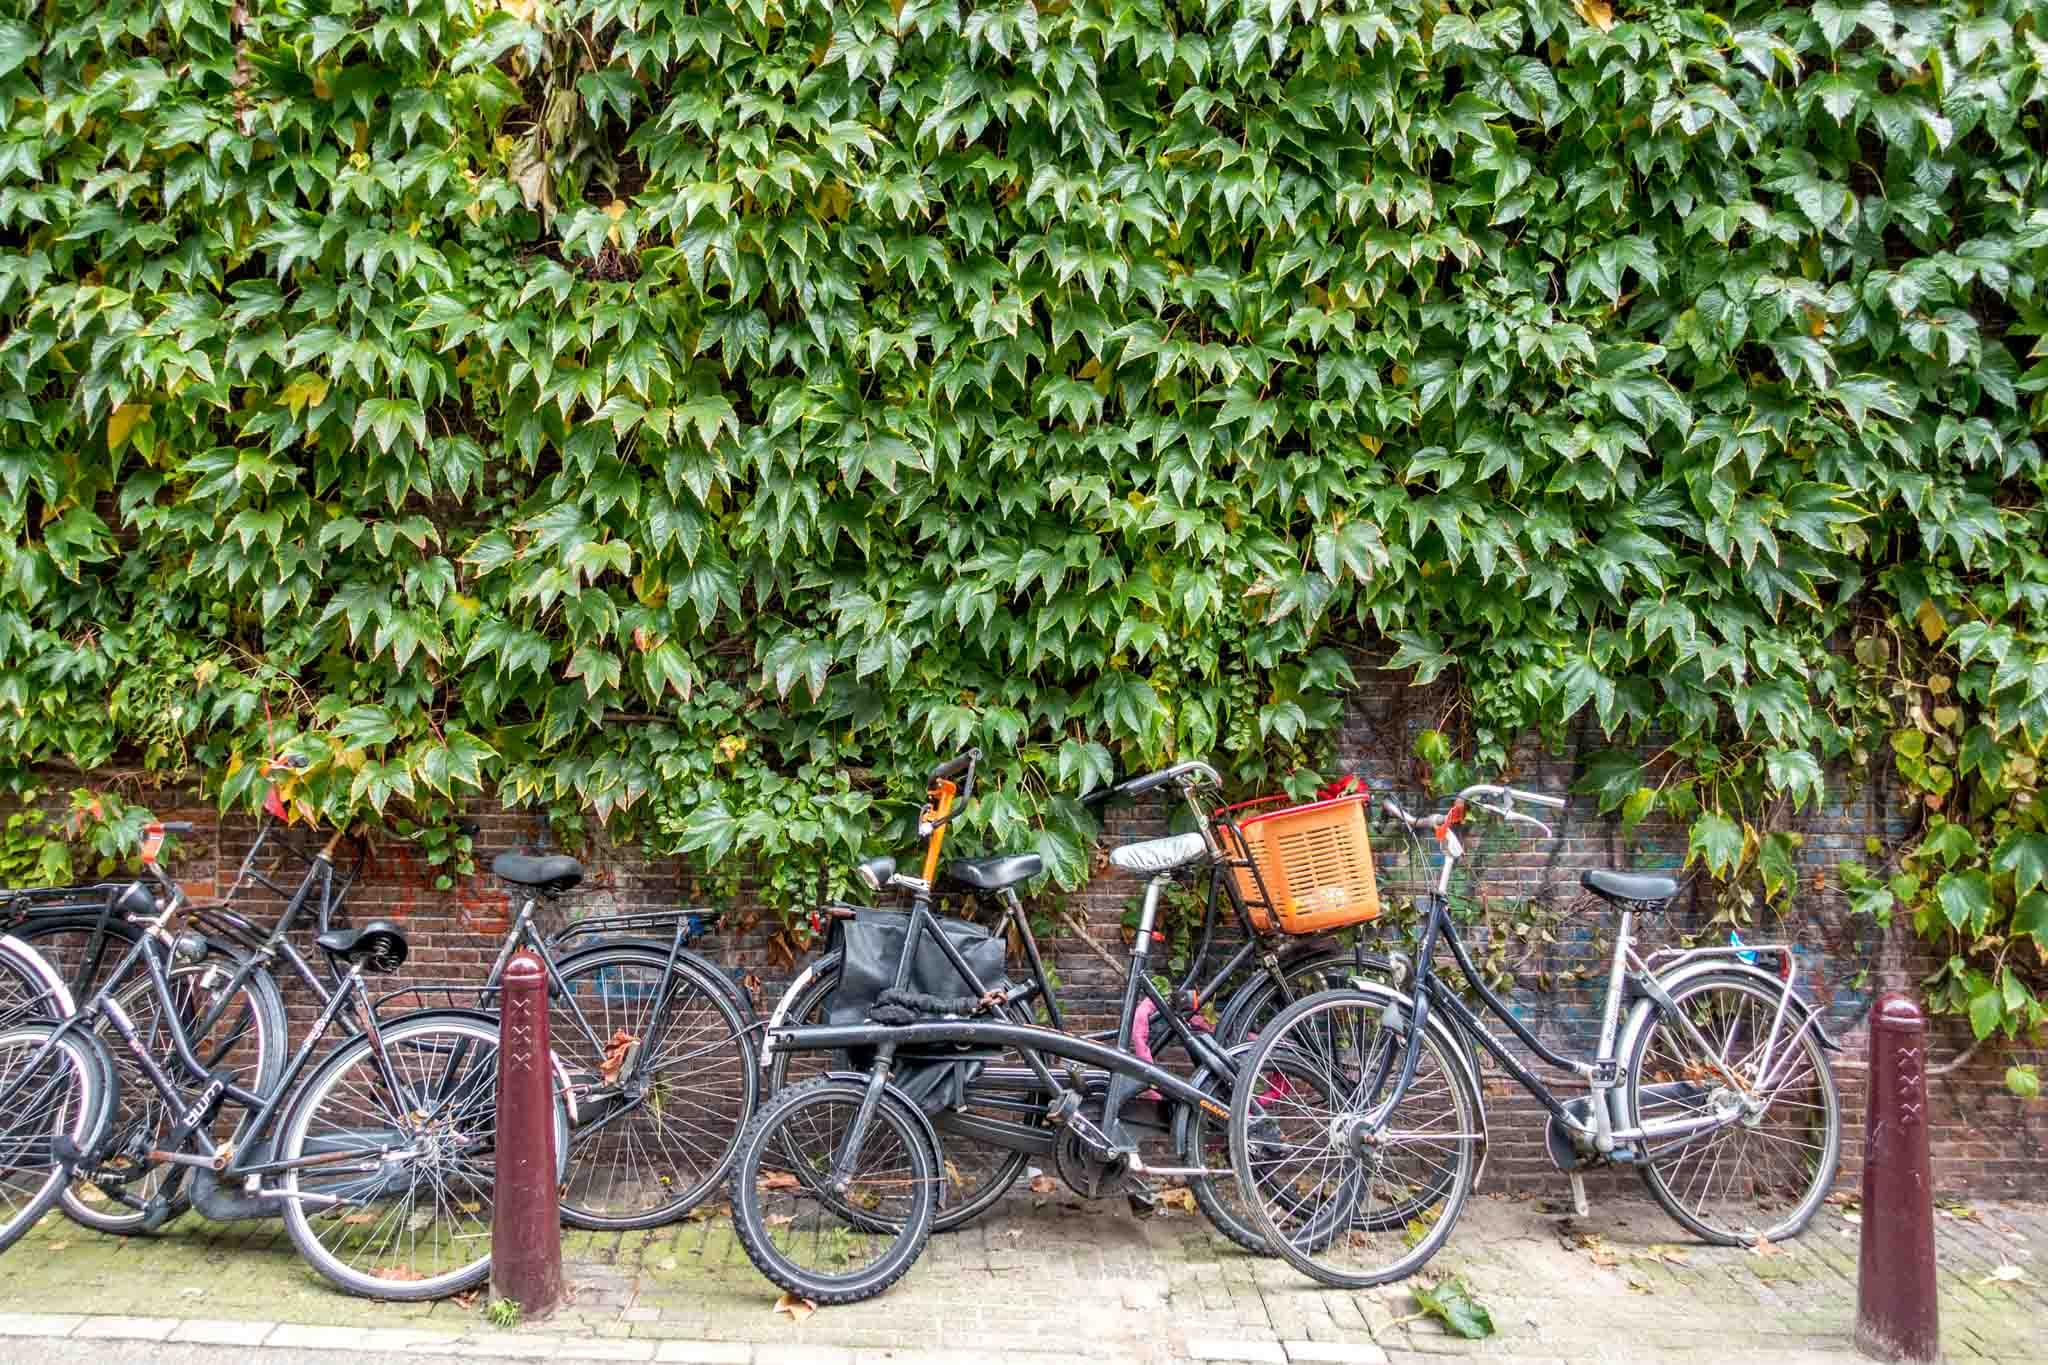 Bikes in the Jordaan neighborhood, one of the top Amsterdam places to visit